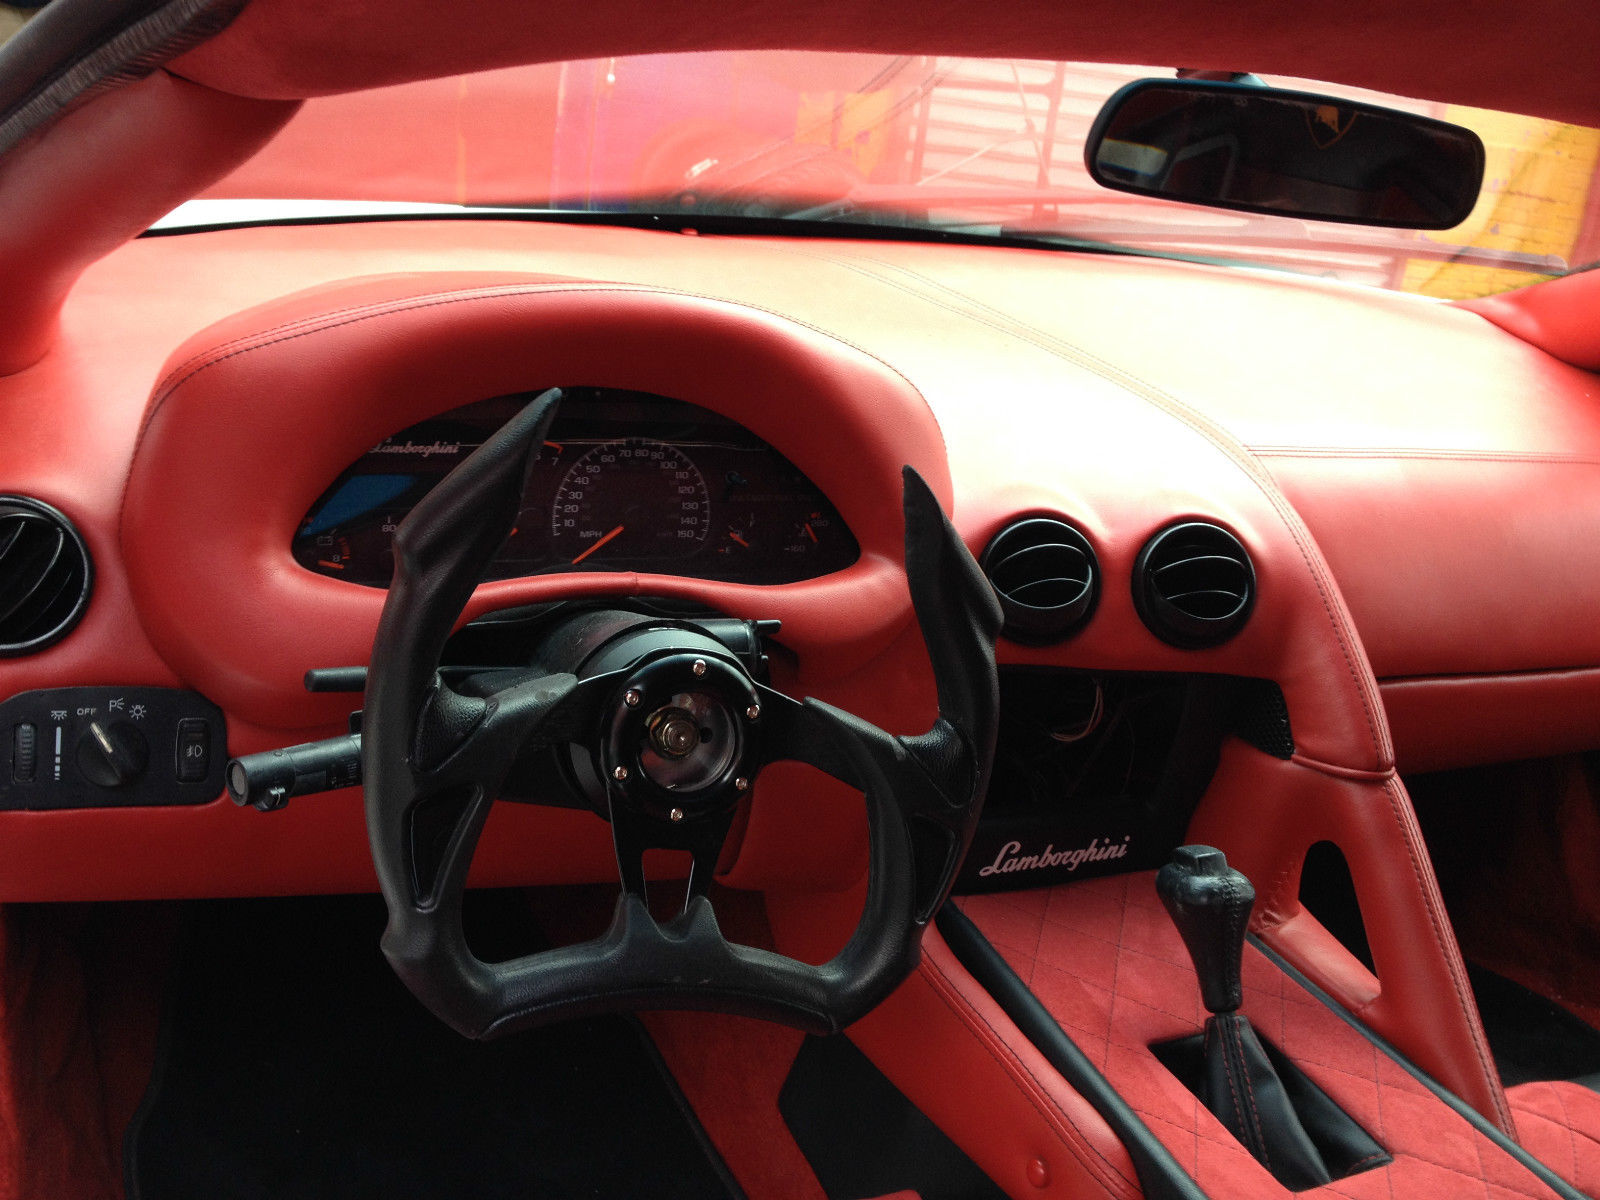 Anybody Want A Kit Car Lamborghini Murci Lago Based Off Of A 1995 Chevy Camaro